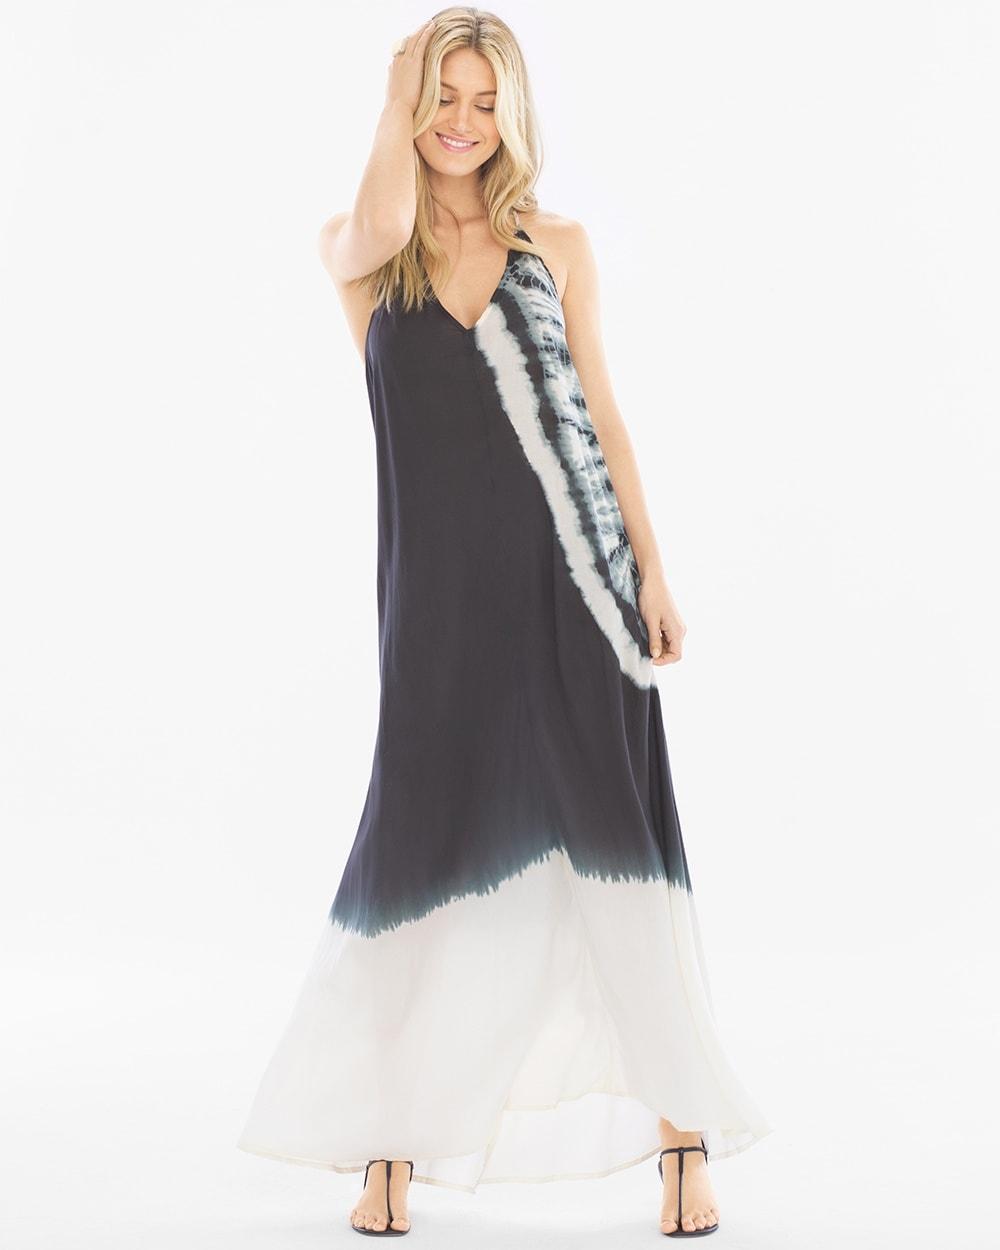 69833f4154 Strappy Tie Dye Coverup Maxi Dress Black - Soma